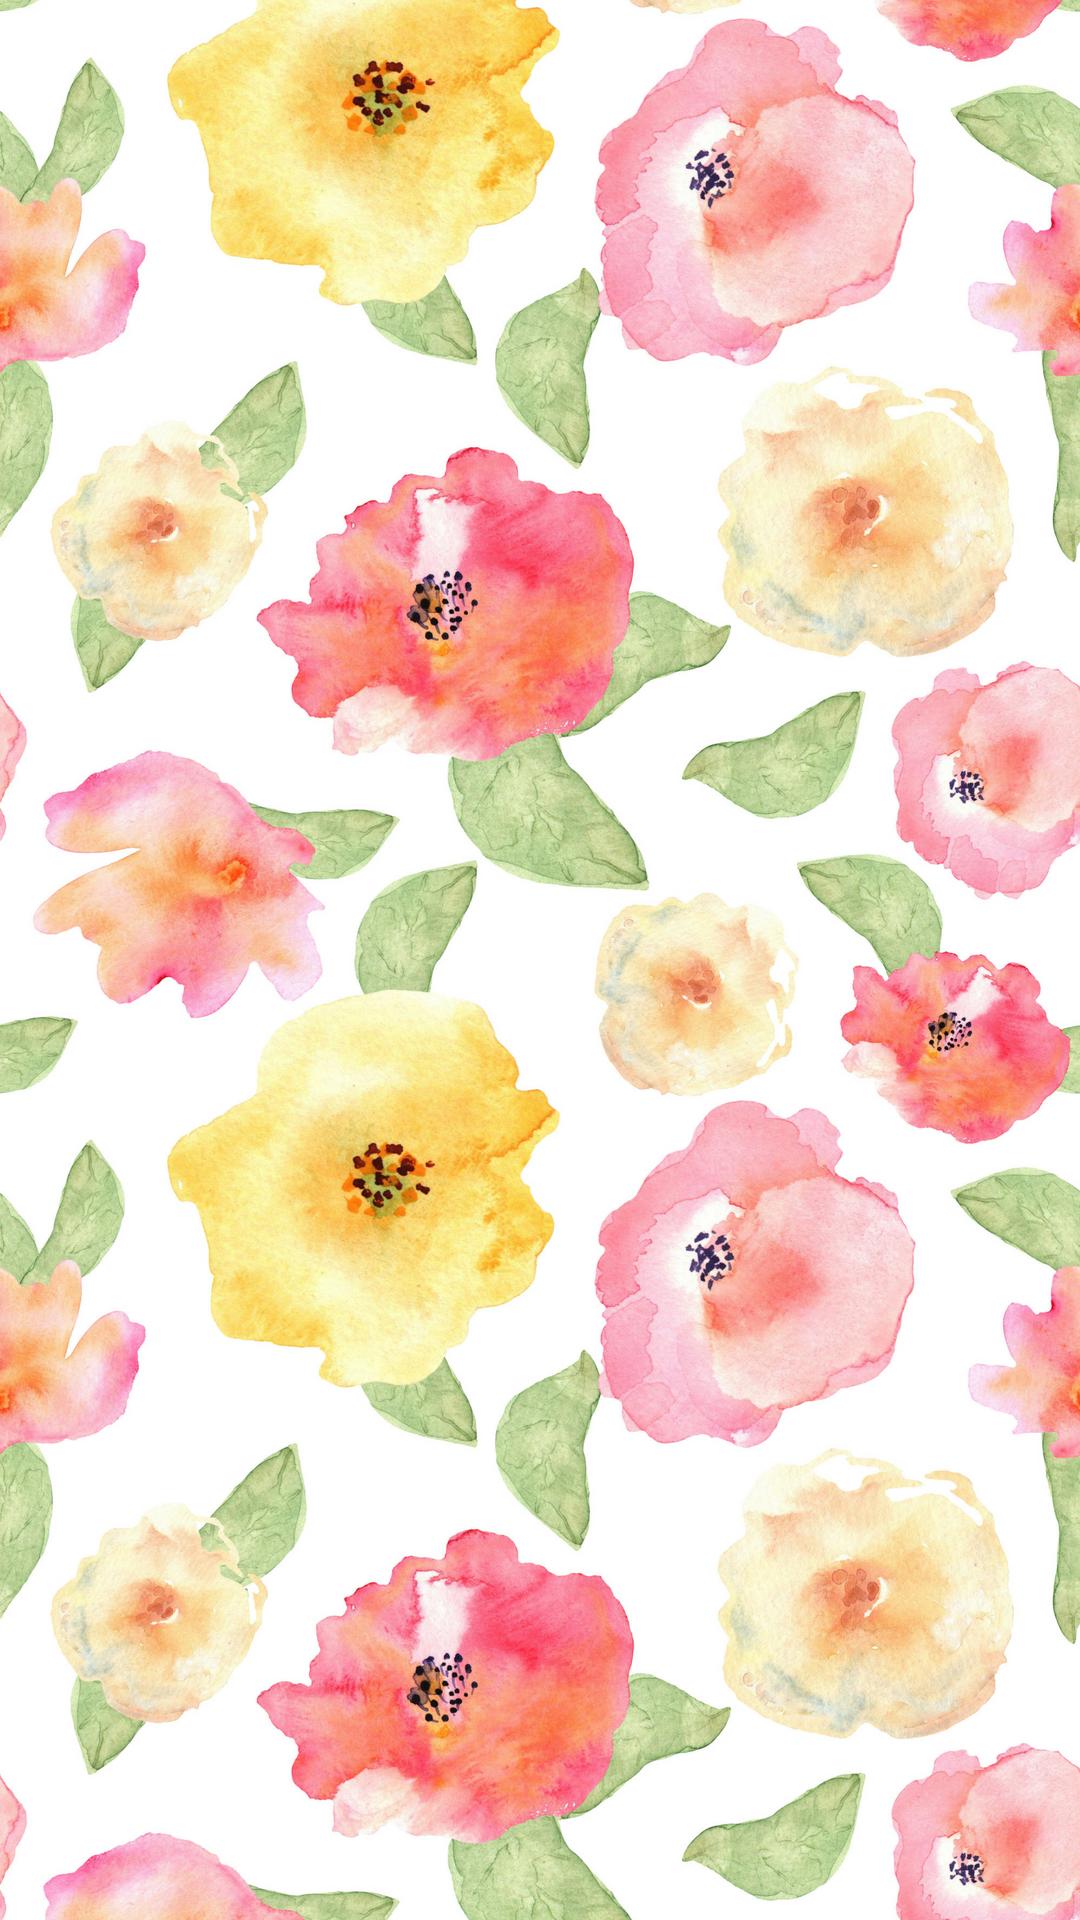 Watercolor Floral Phone Backgound Png 1 080 1 920 Pixels Ipad